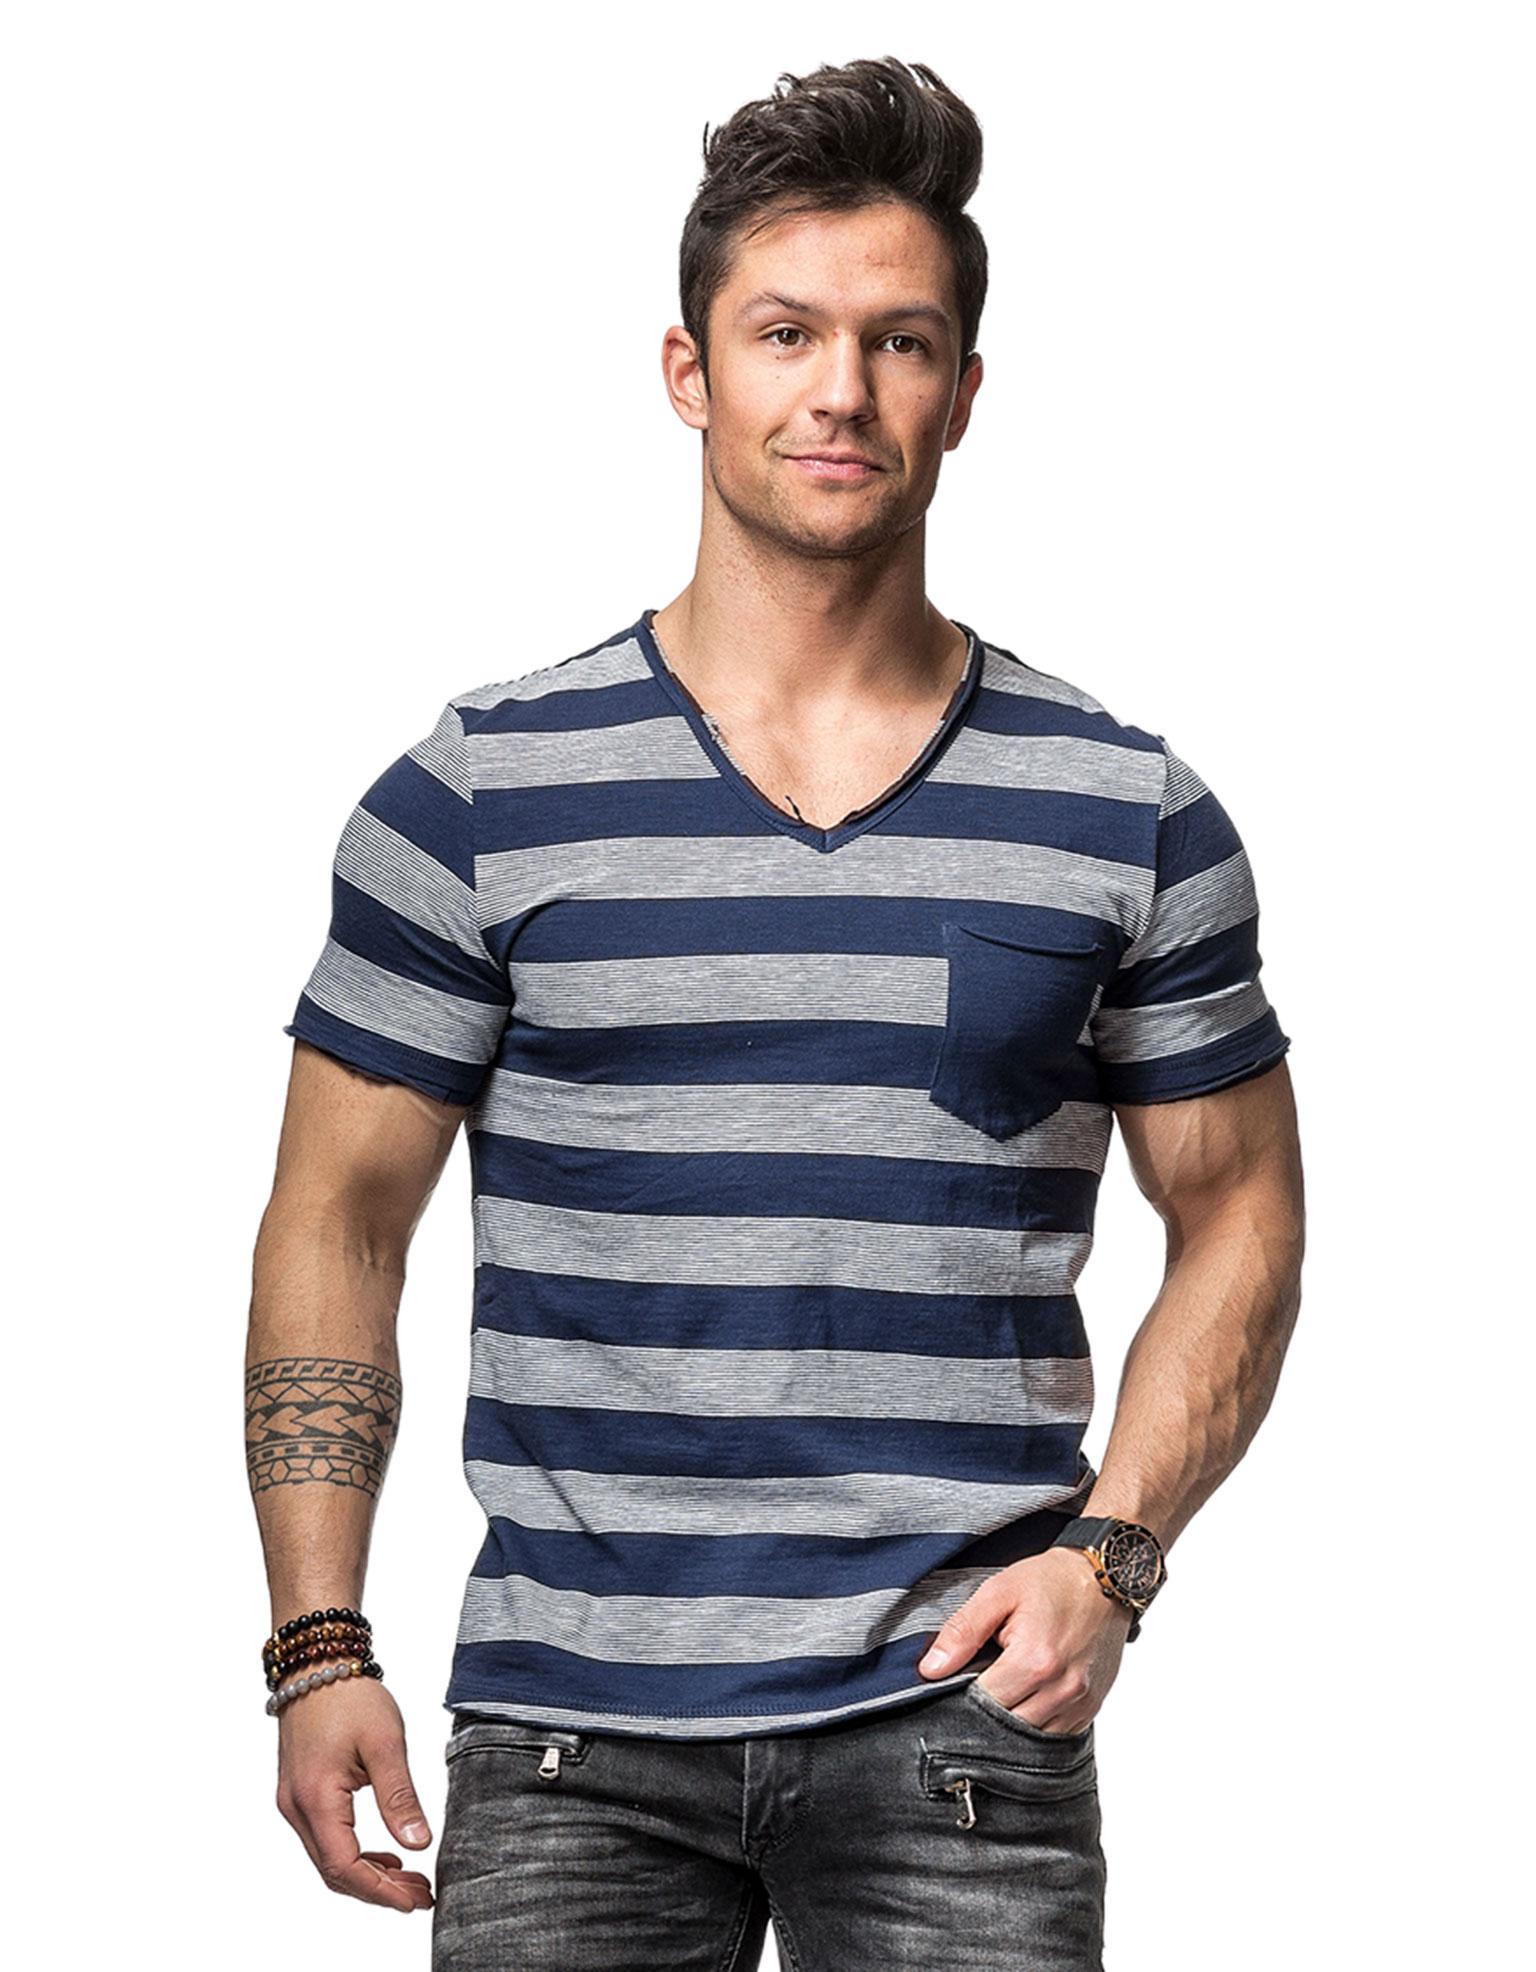 yandyed blue tom tailor 6814 t shirts